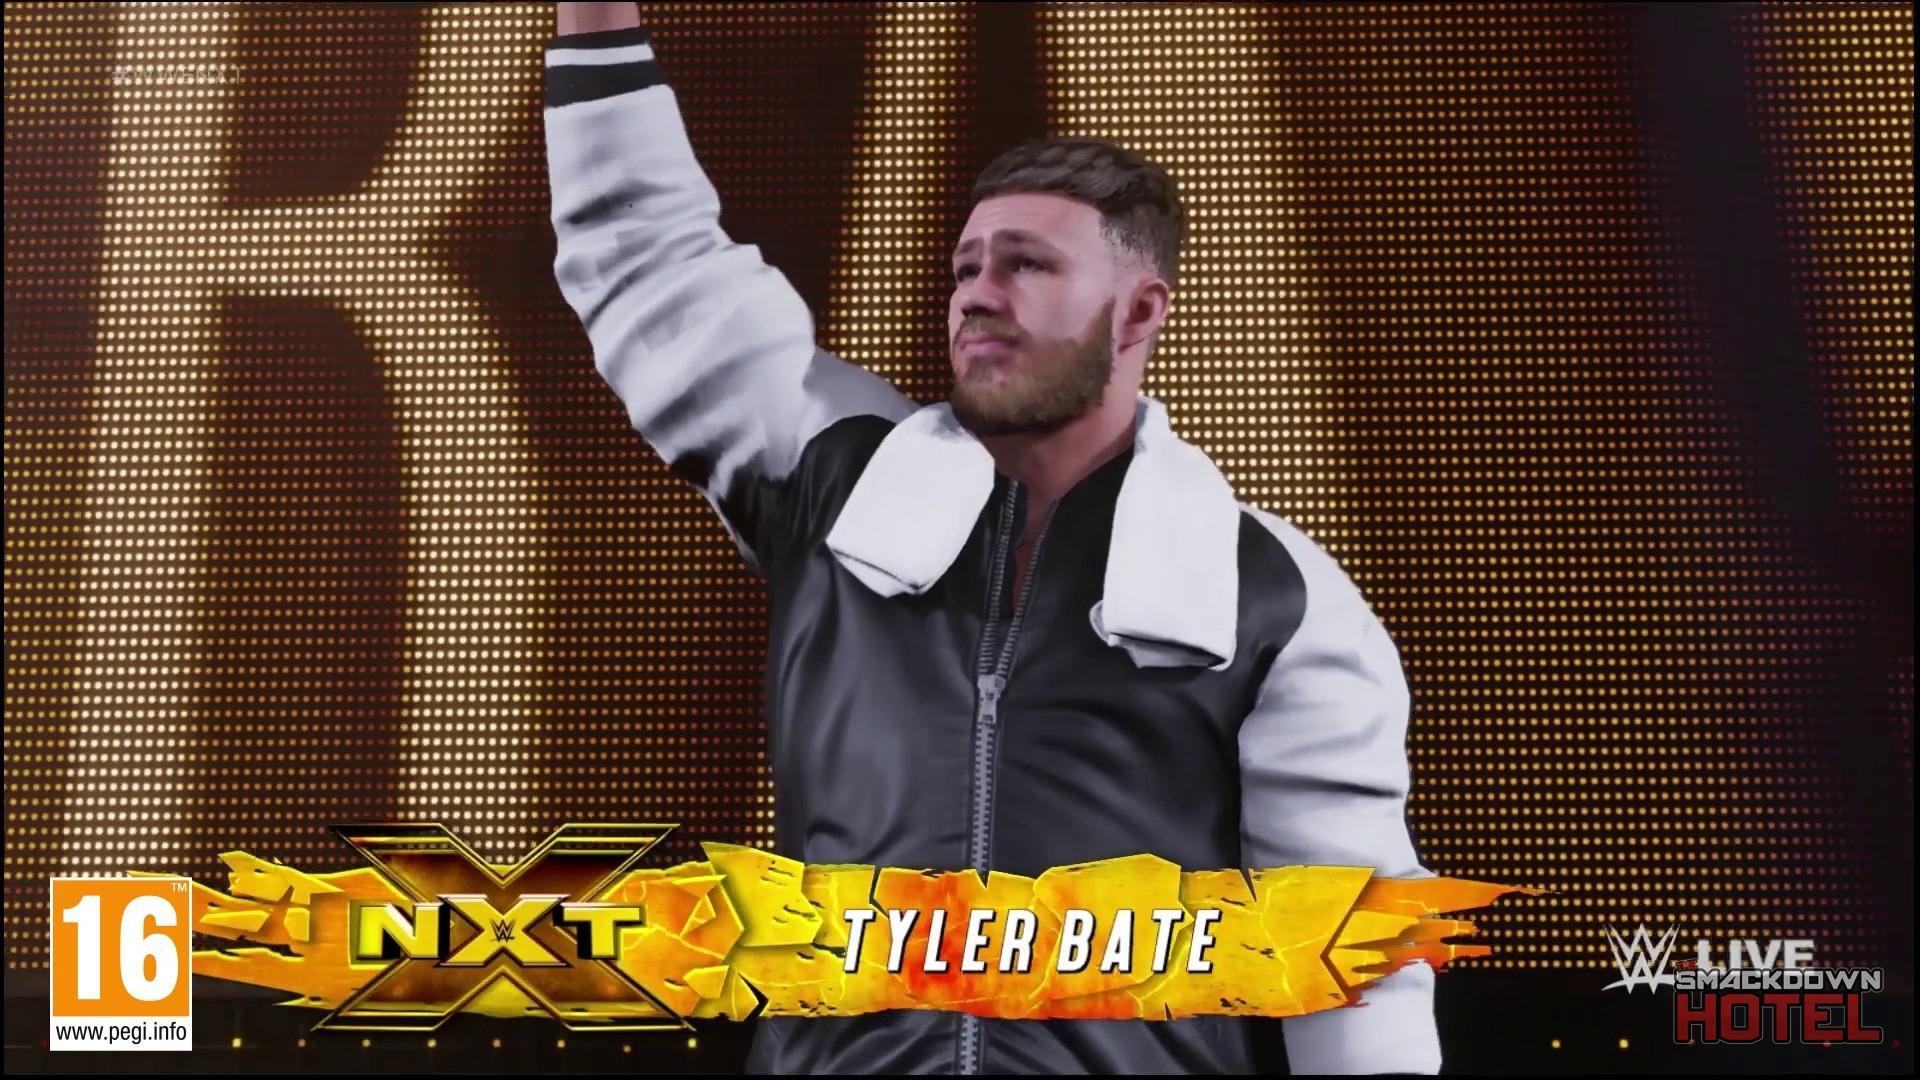 WWE 2K19 : Pete Dunne & Tyler Bate - Entrées + screenshots  WWE_2K19_TylerBate_1-15328-1080